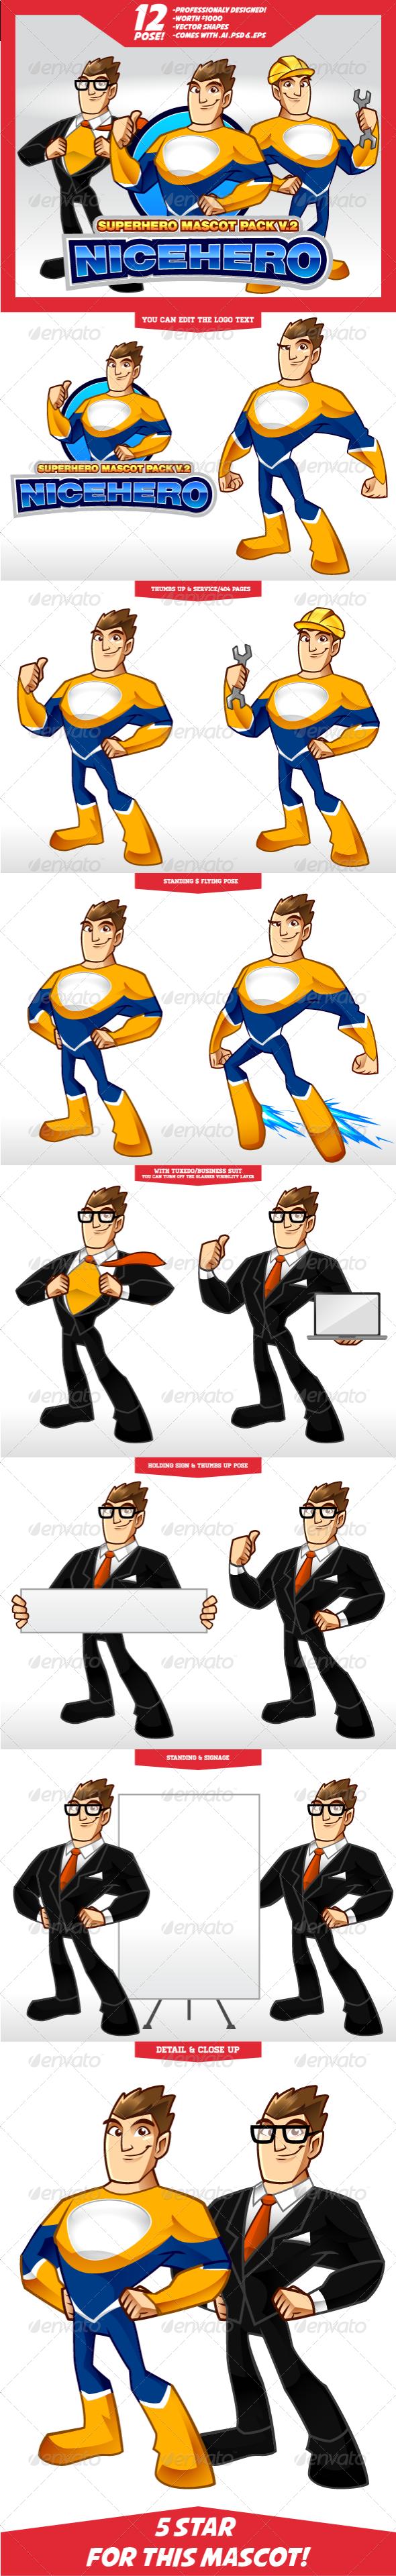 GraphicRiver Complete Superhero Mascot V.2 5630630